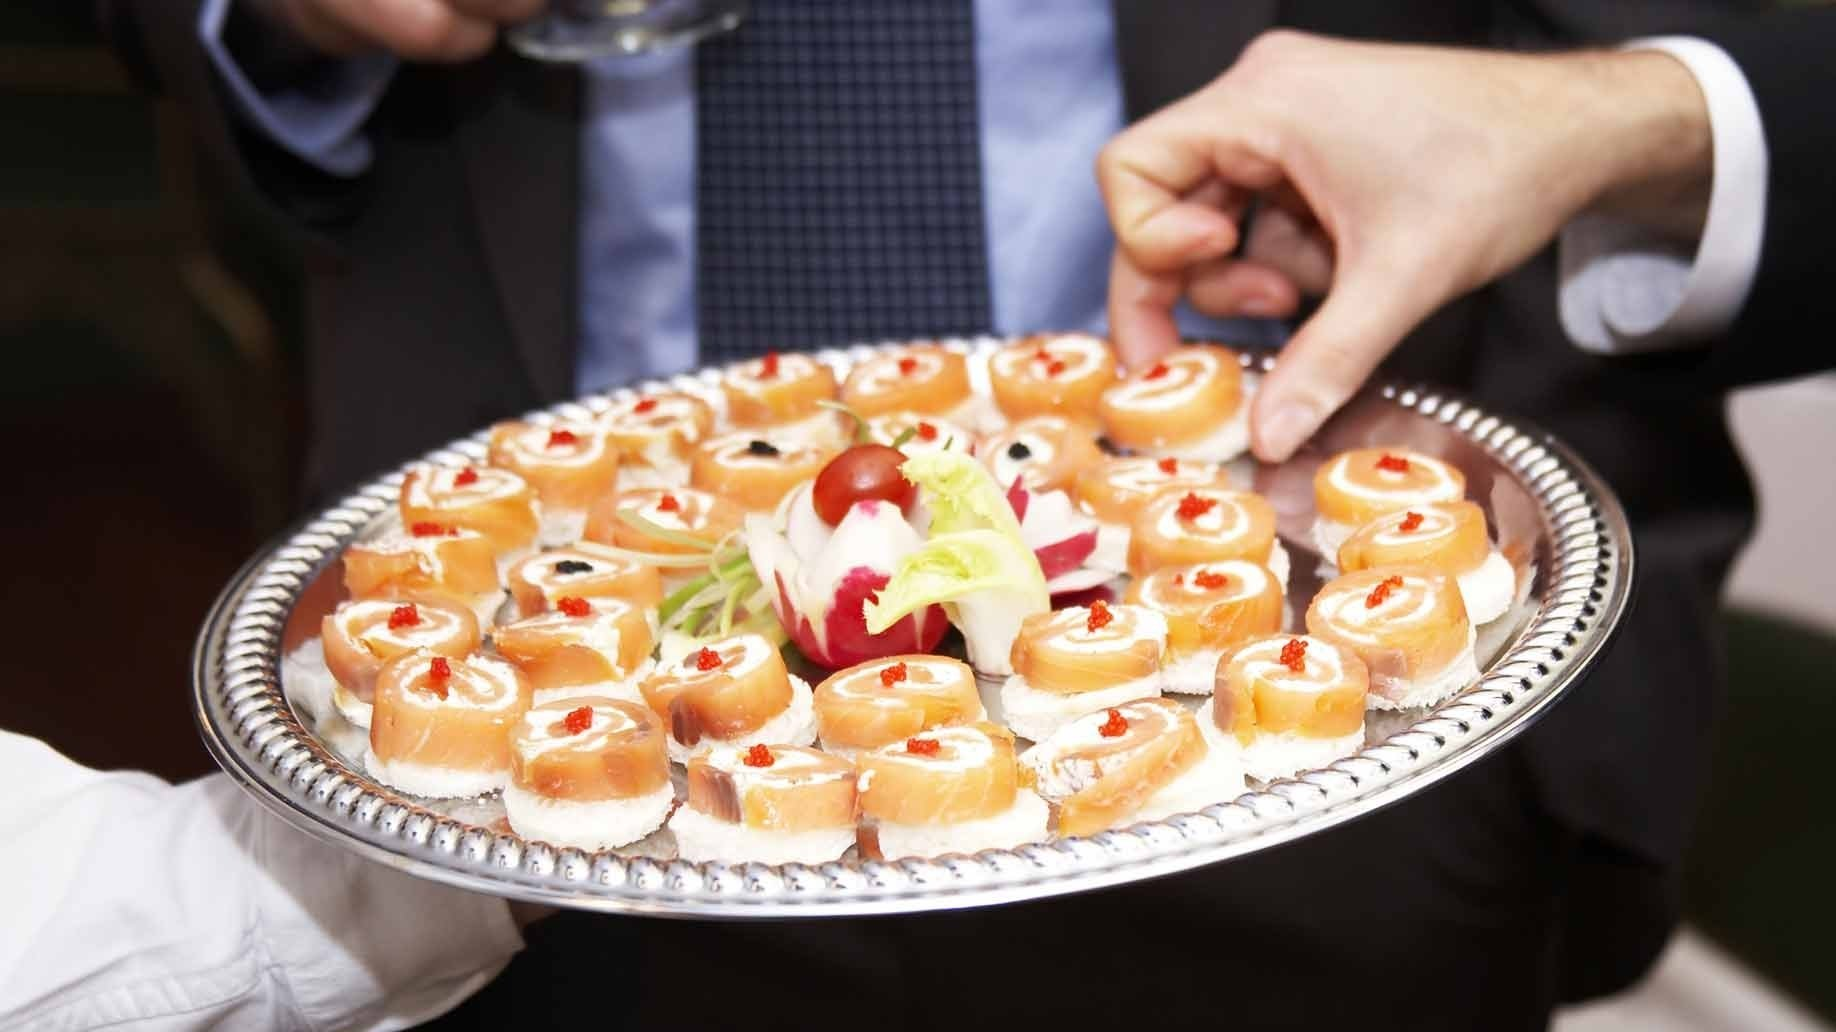 10 Perfect Cheap Food Ideas For Wedding 23 cheap wedding reception food drink menu ideas on a budget 11 2020